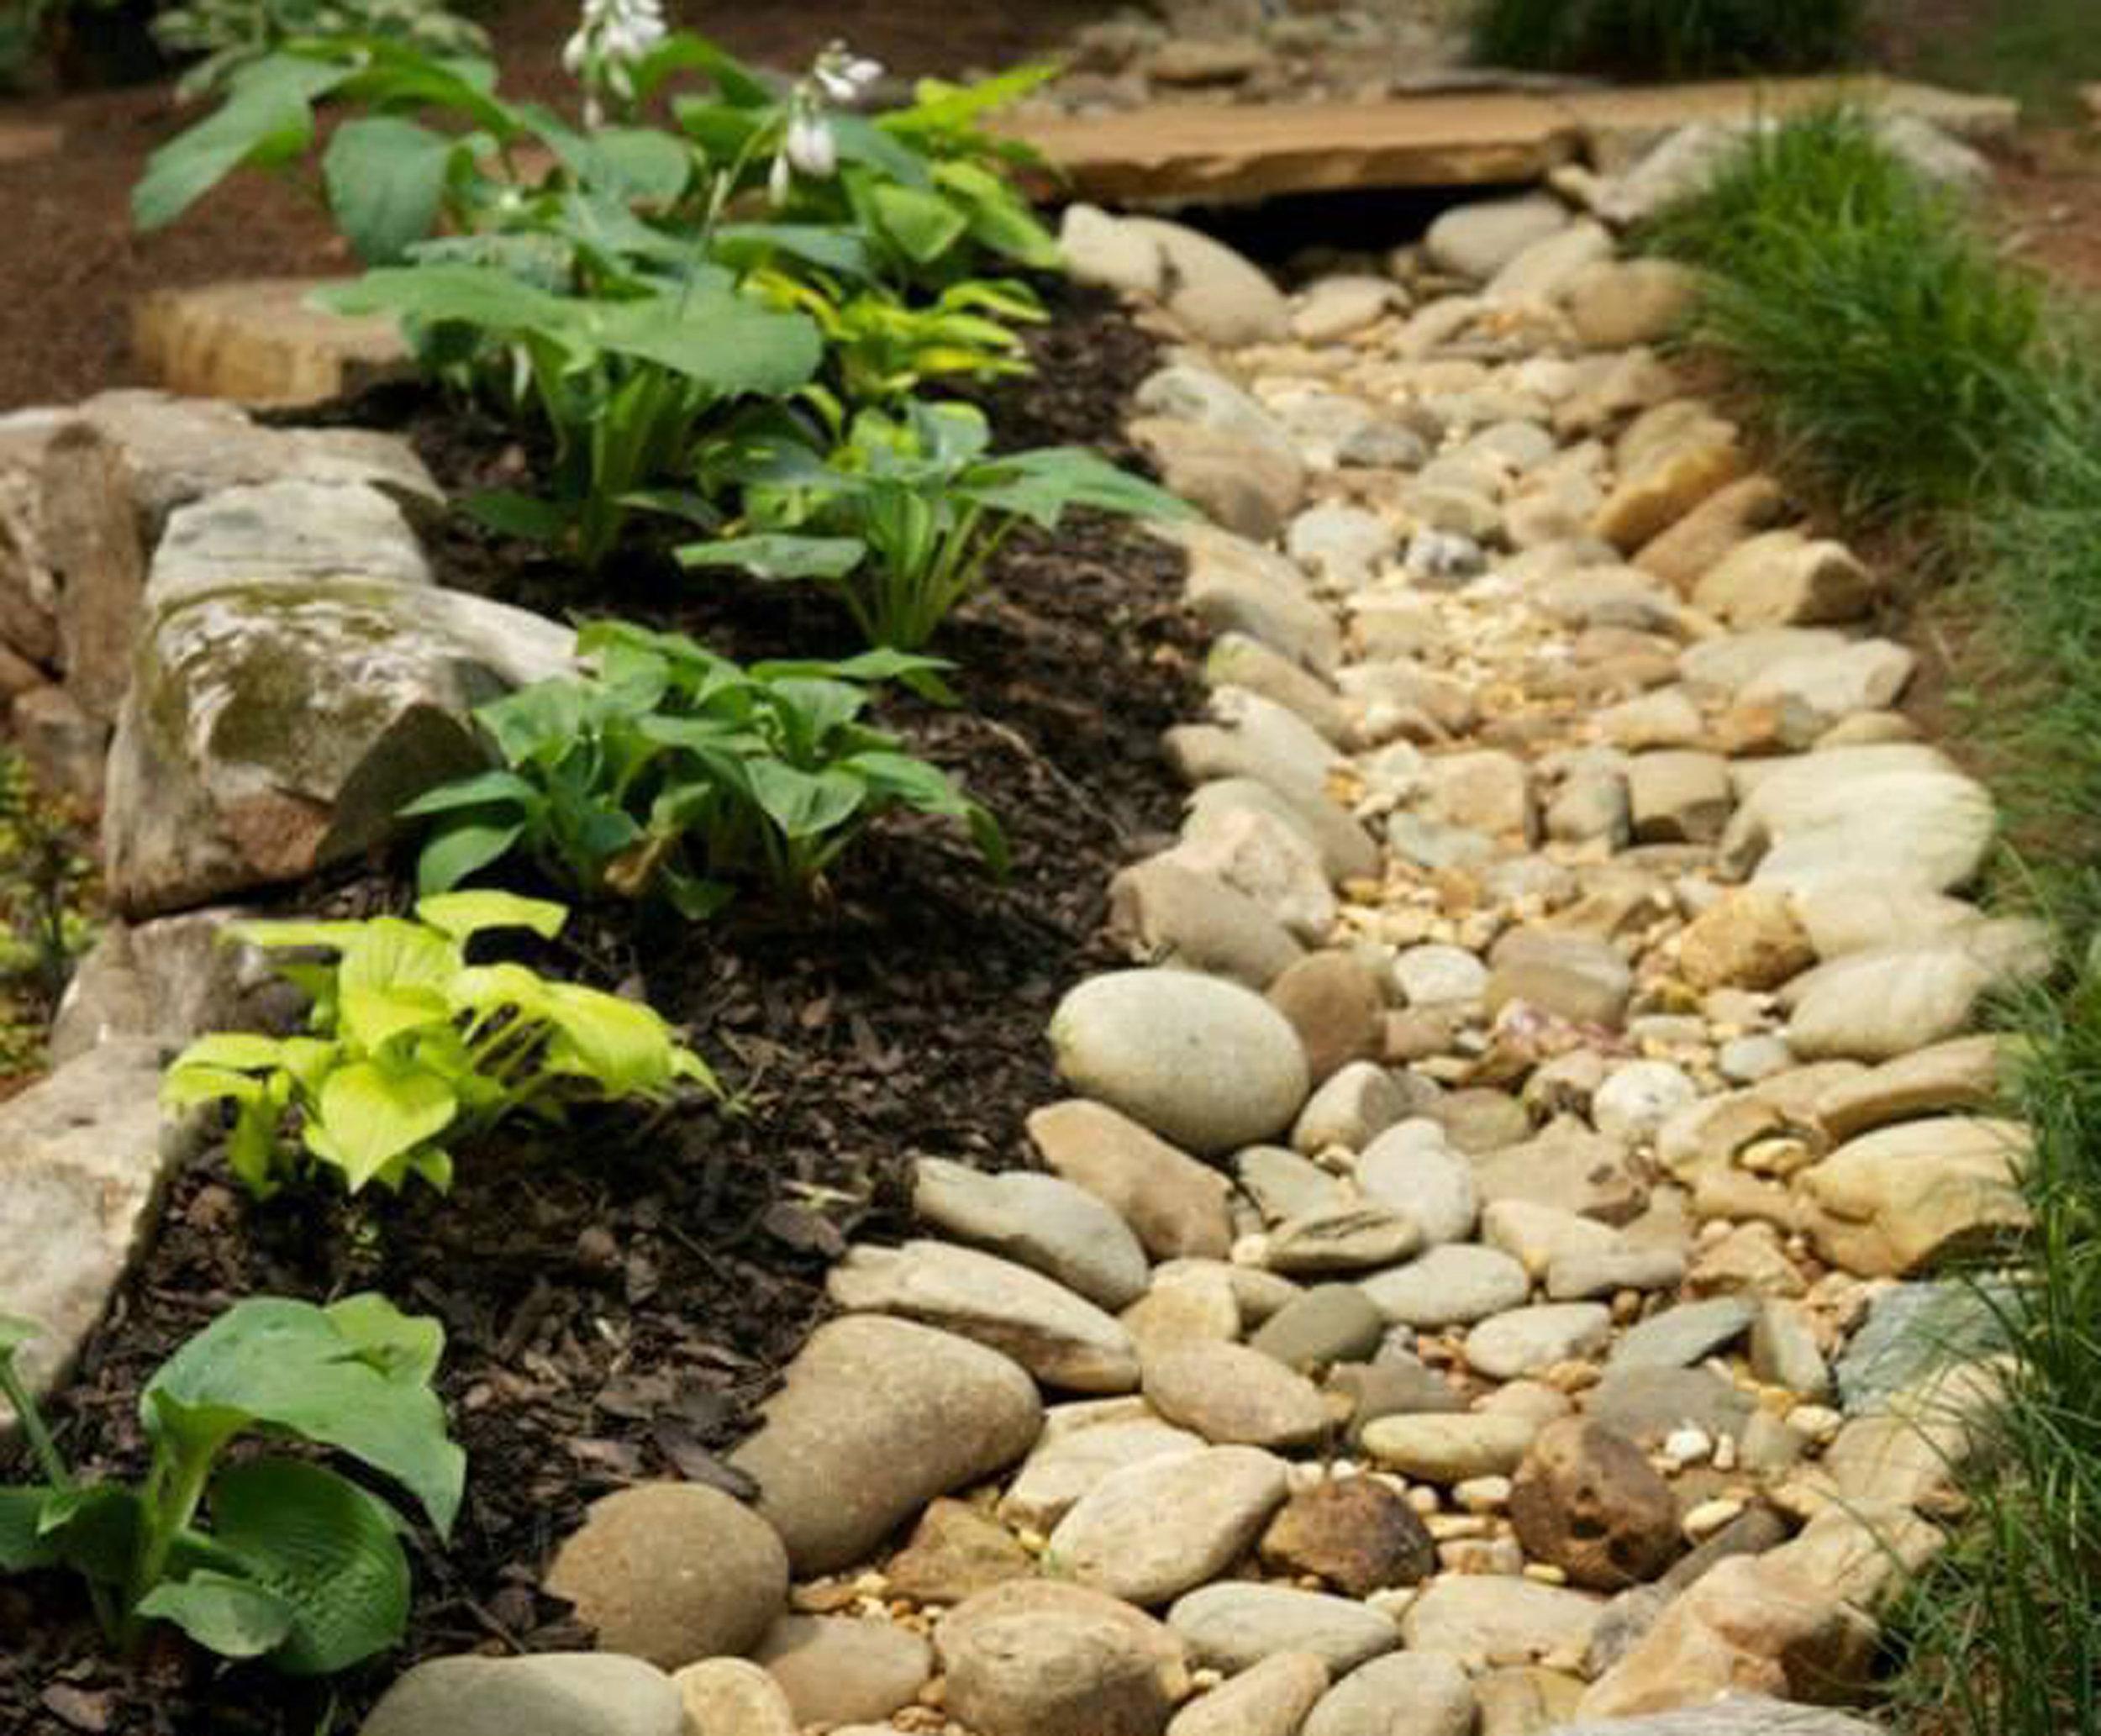 dry-creek-bed-river-rocks.jpg